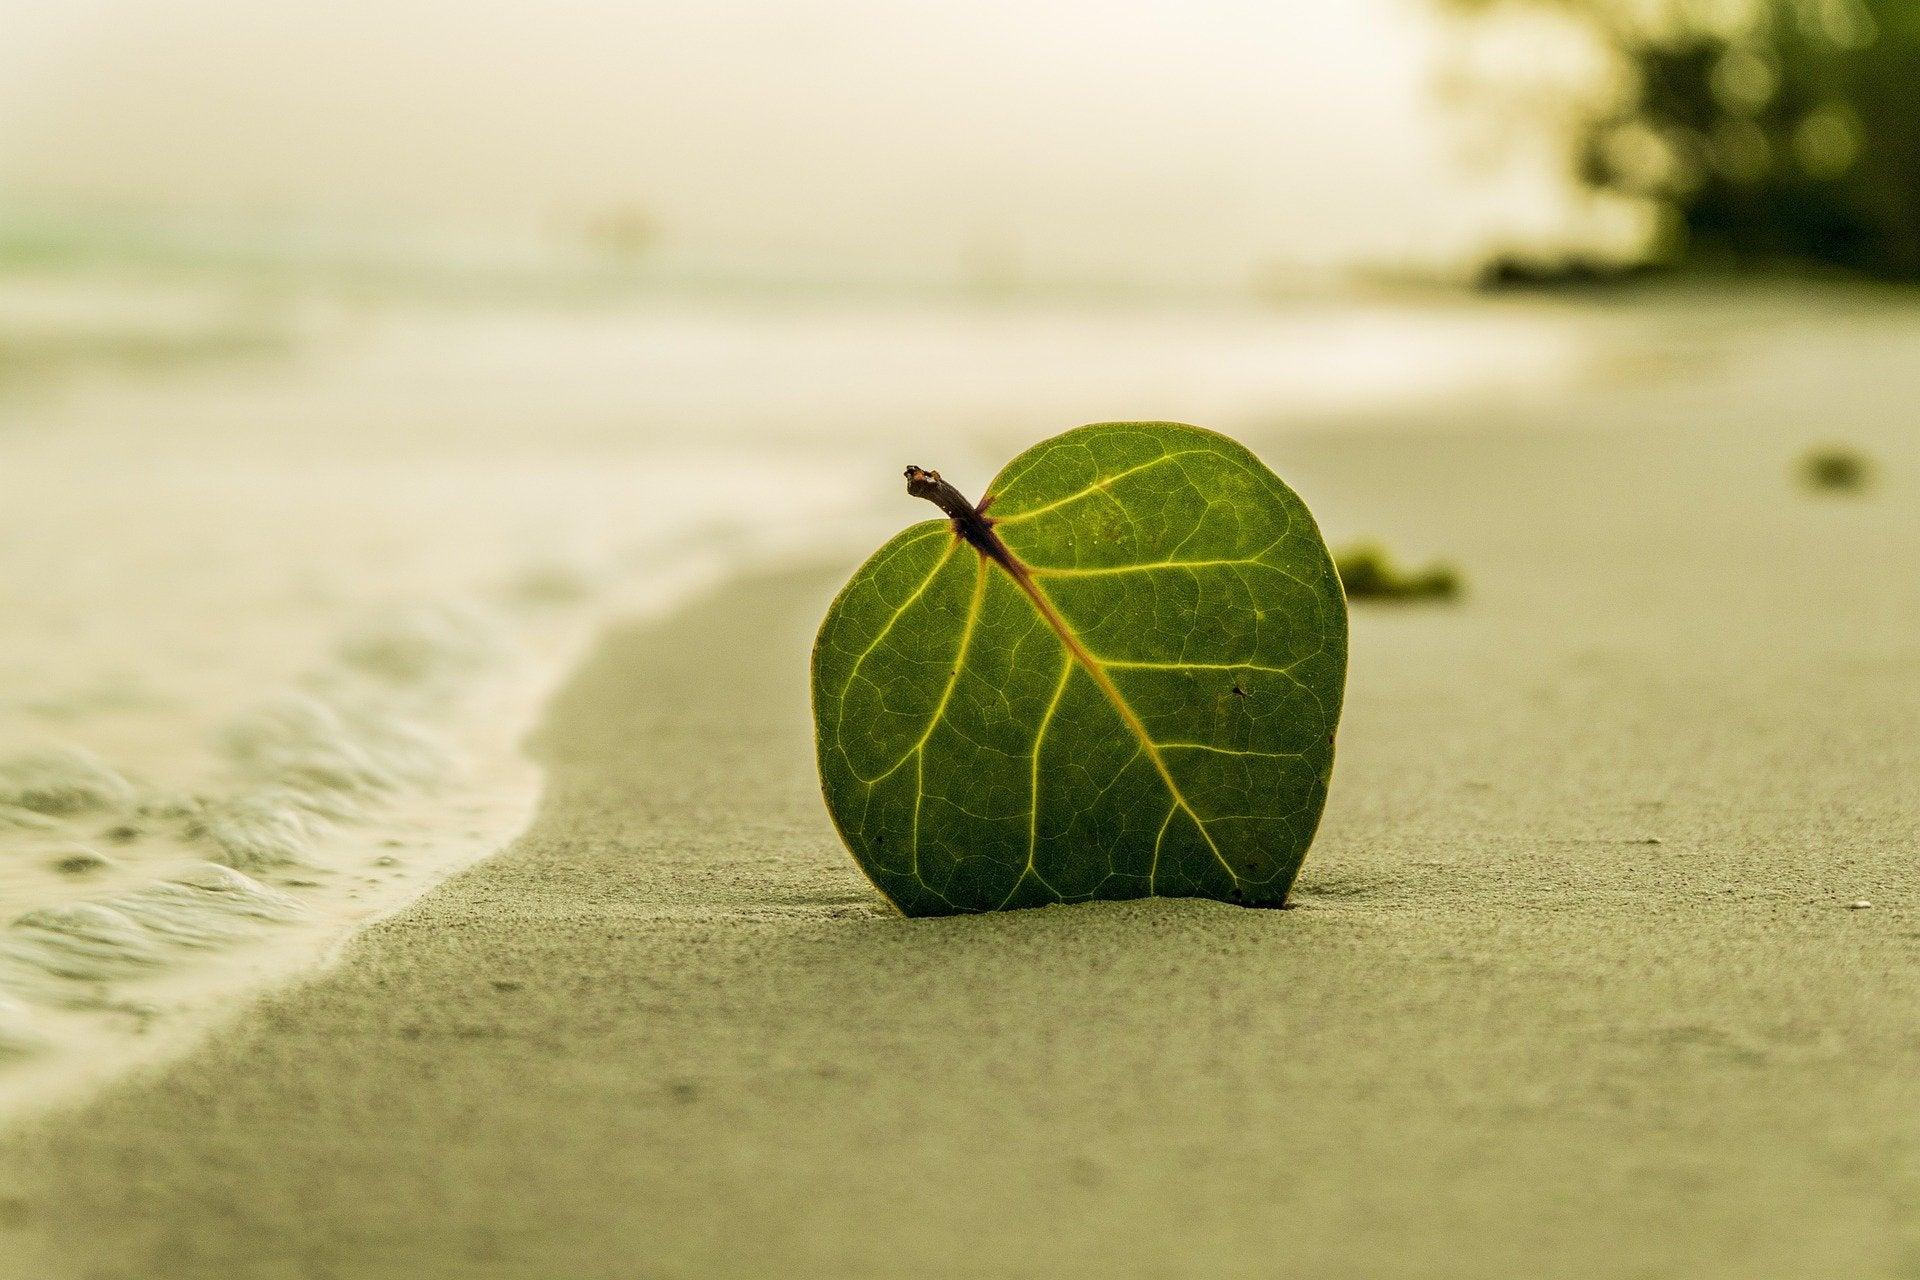 Лист на пляже песок море лето зелень дерево